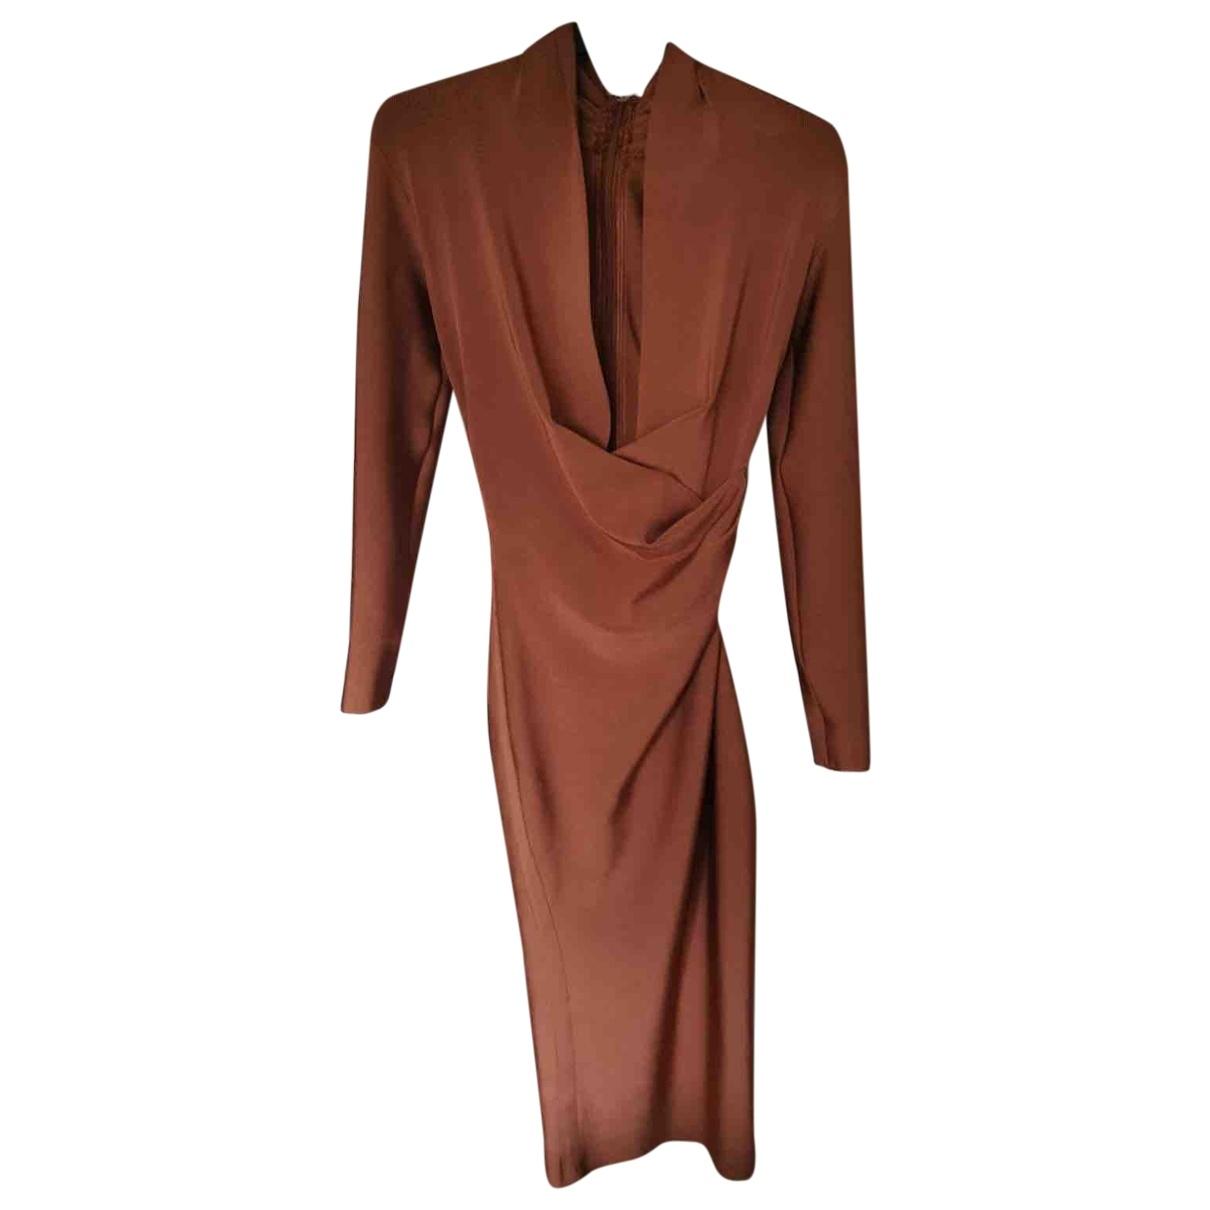 House Of Cb \N Kleid in  Braun Polyester